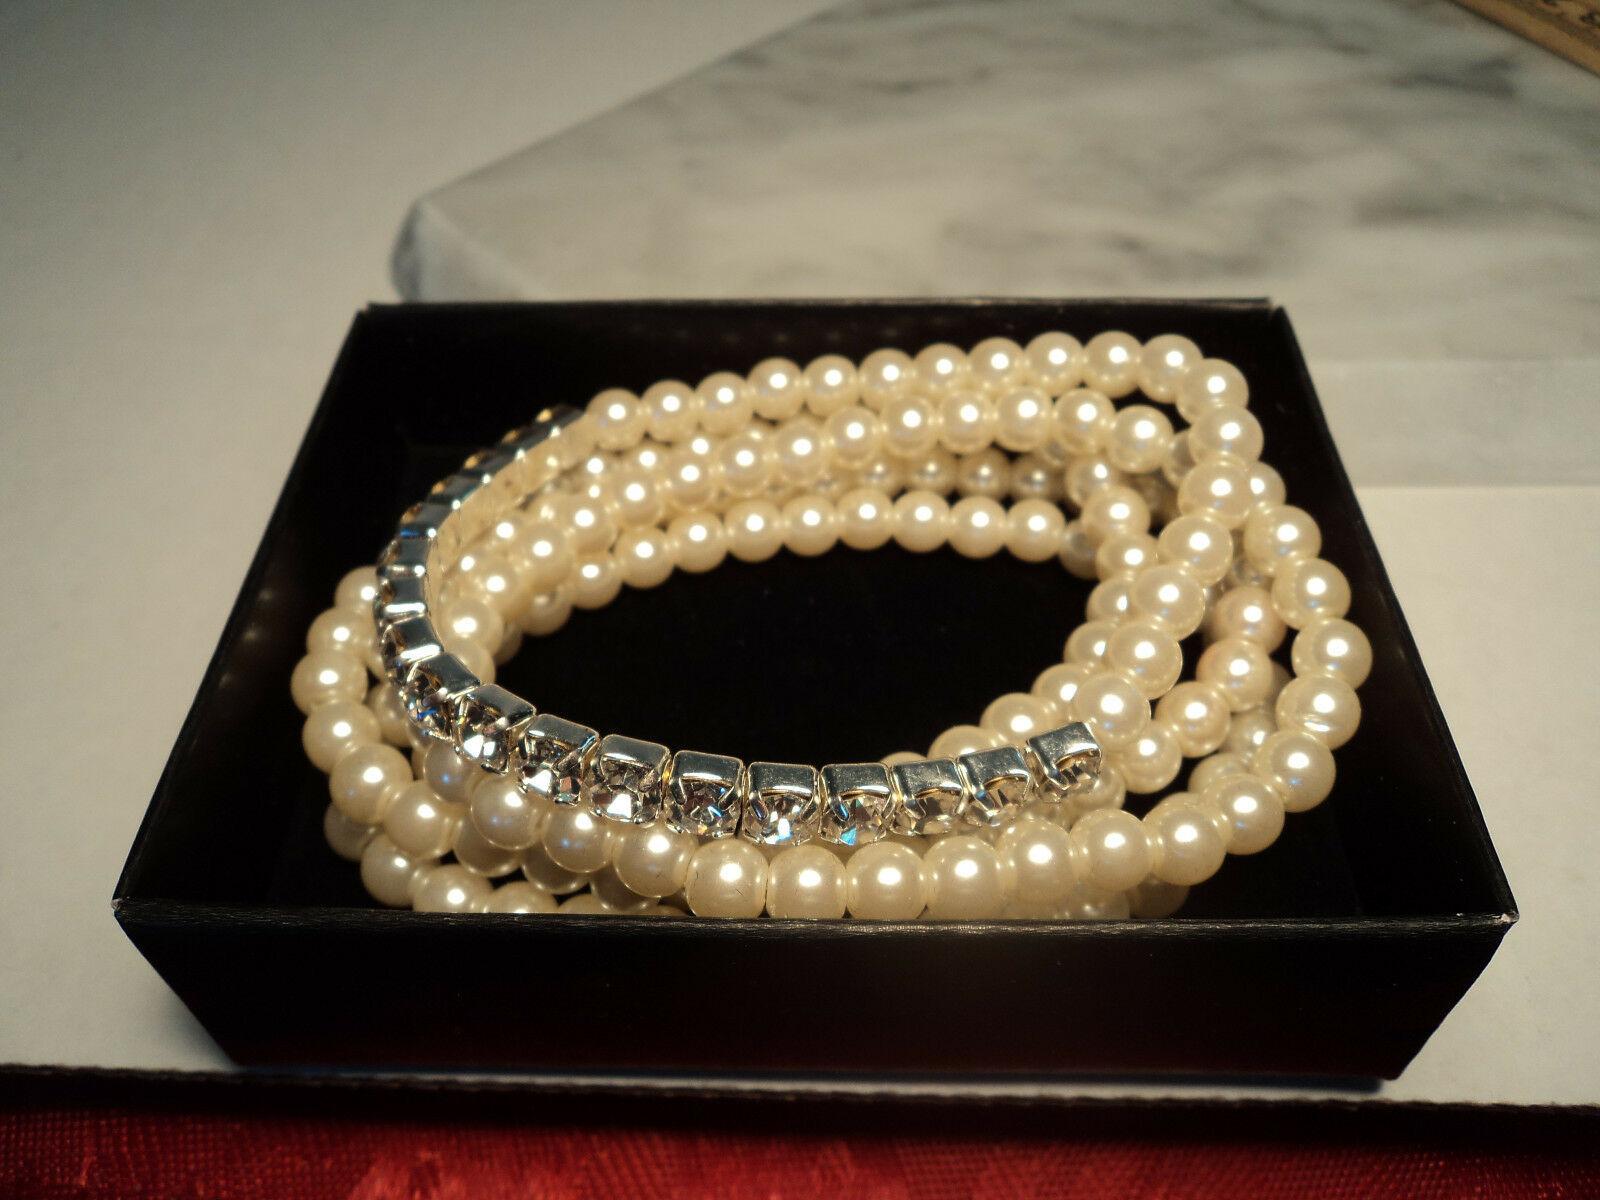 Avon Pretty Pearlesque and Rhinestone Stretch Bracelet Set New 2011 image 5